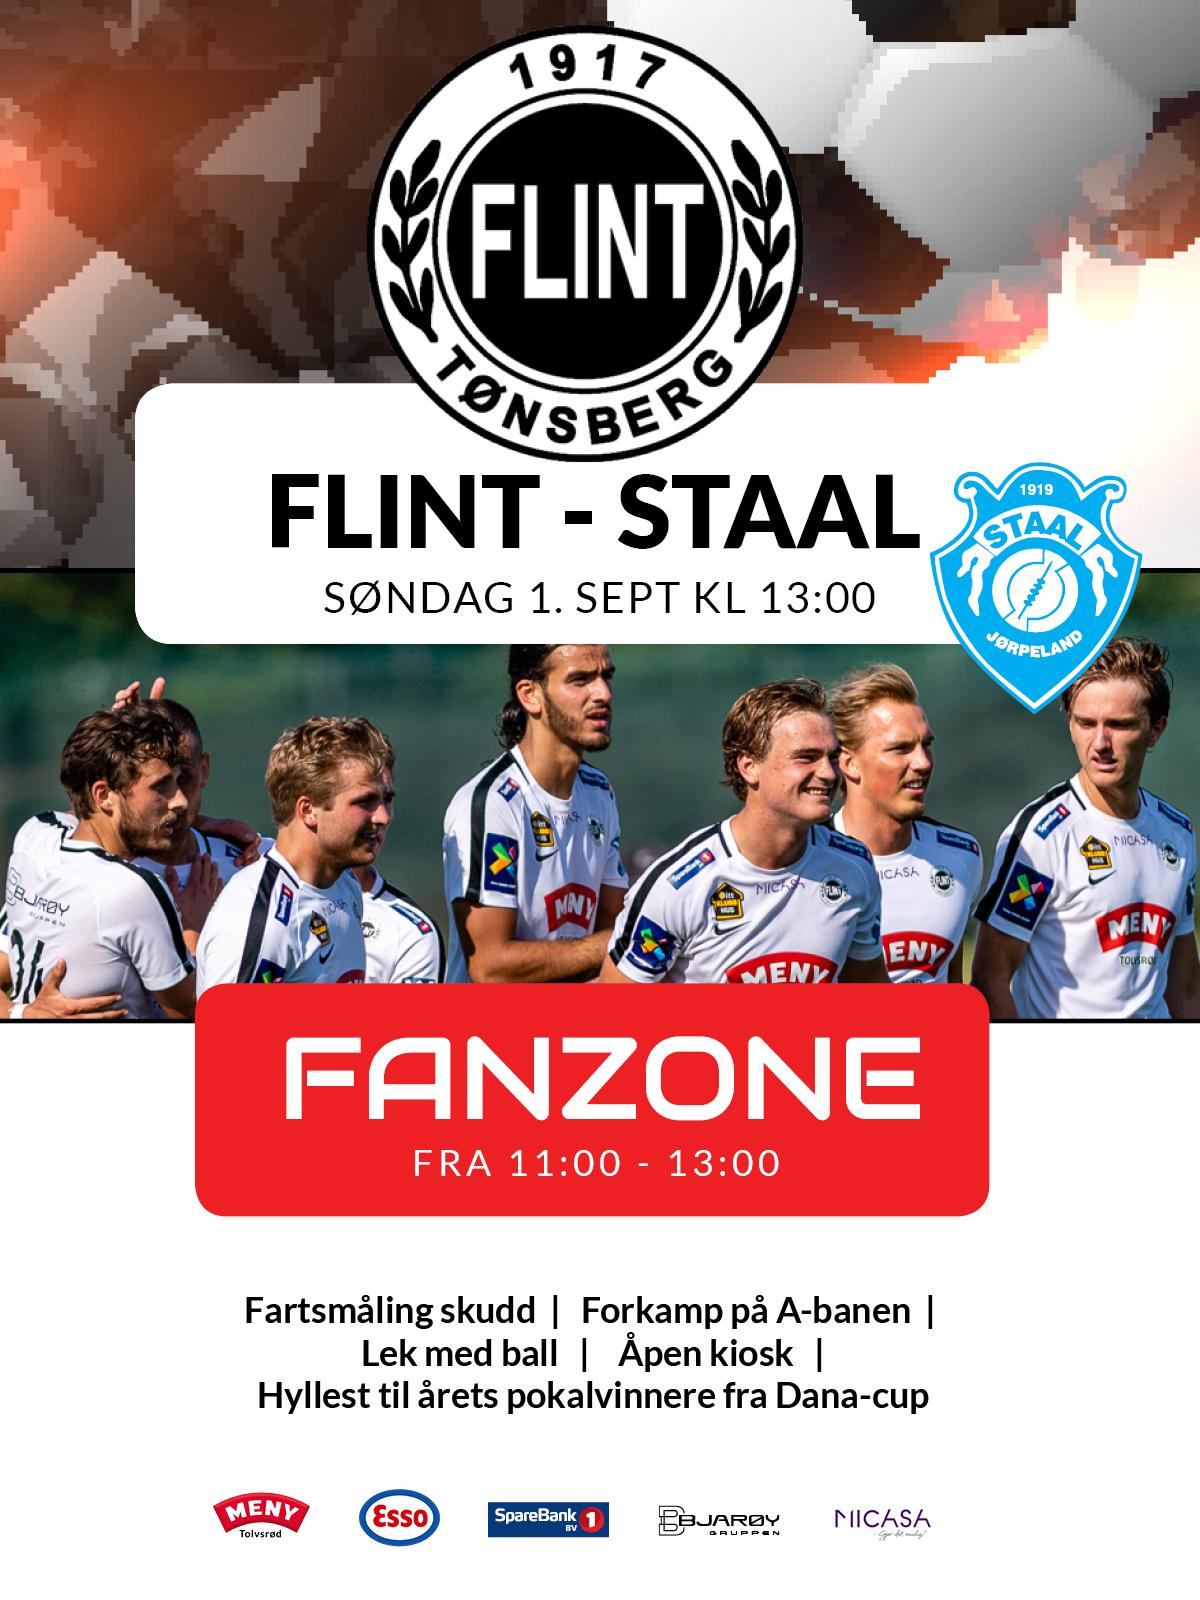 https://www.flintfotball.no/wp-content/uploads/2019/08/Fanzone-plakat3.jpg